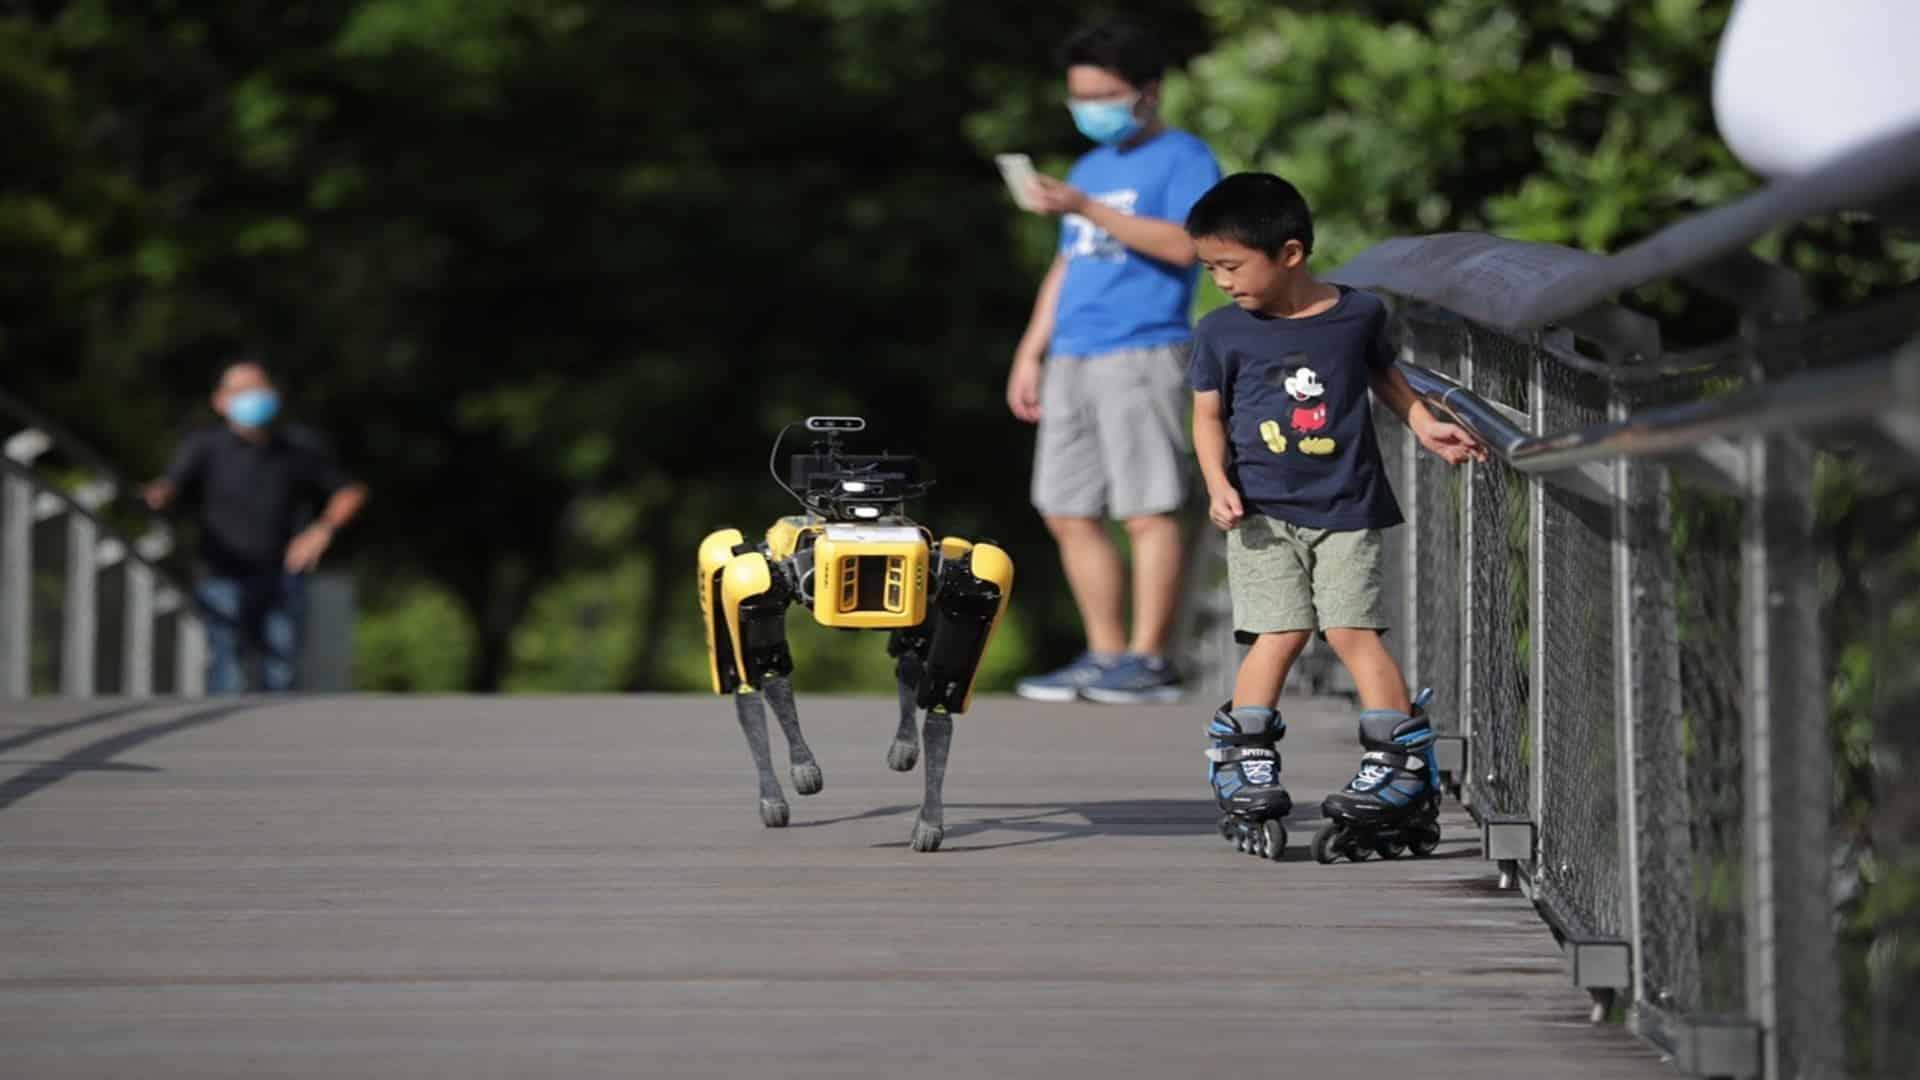 pandemicki roboti